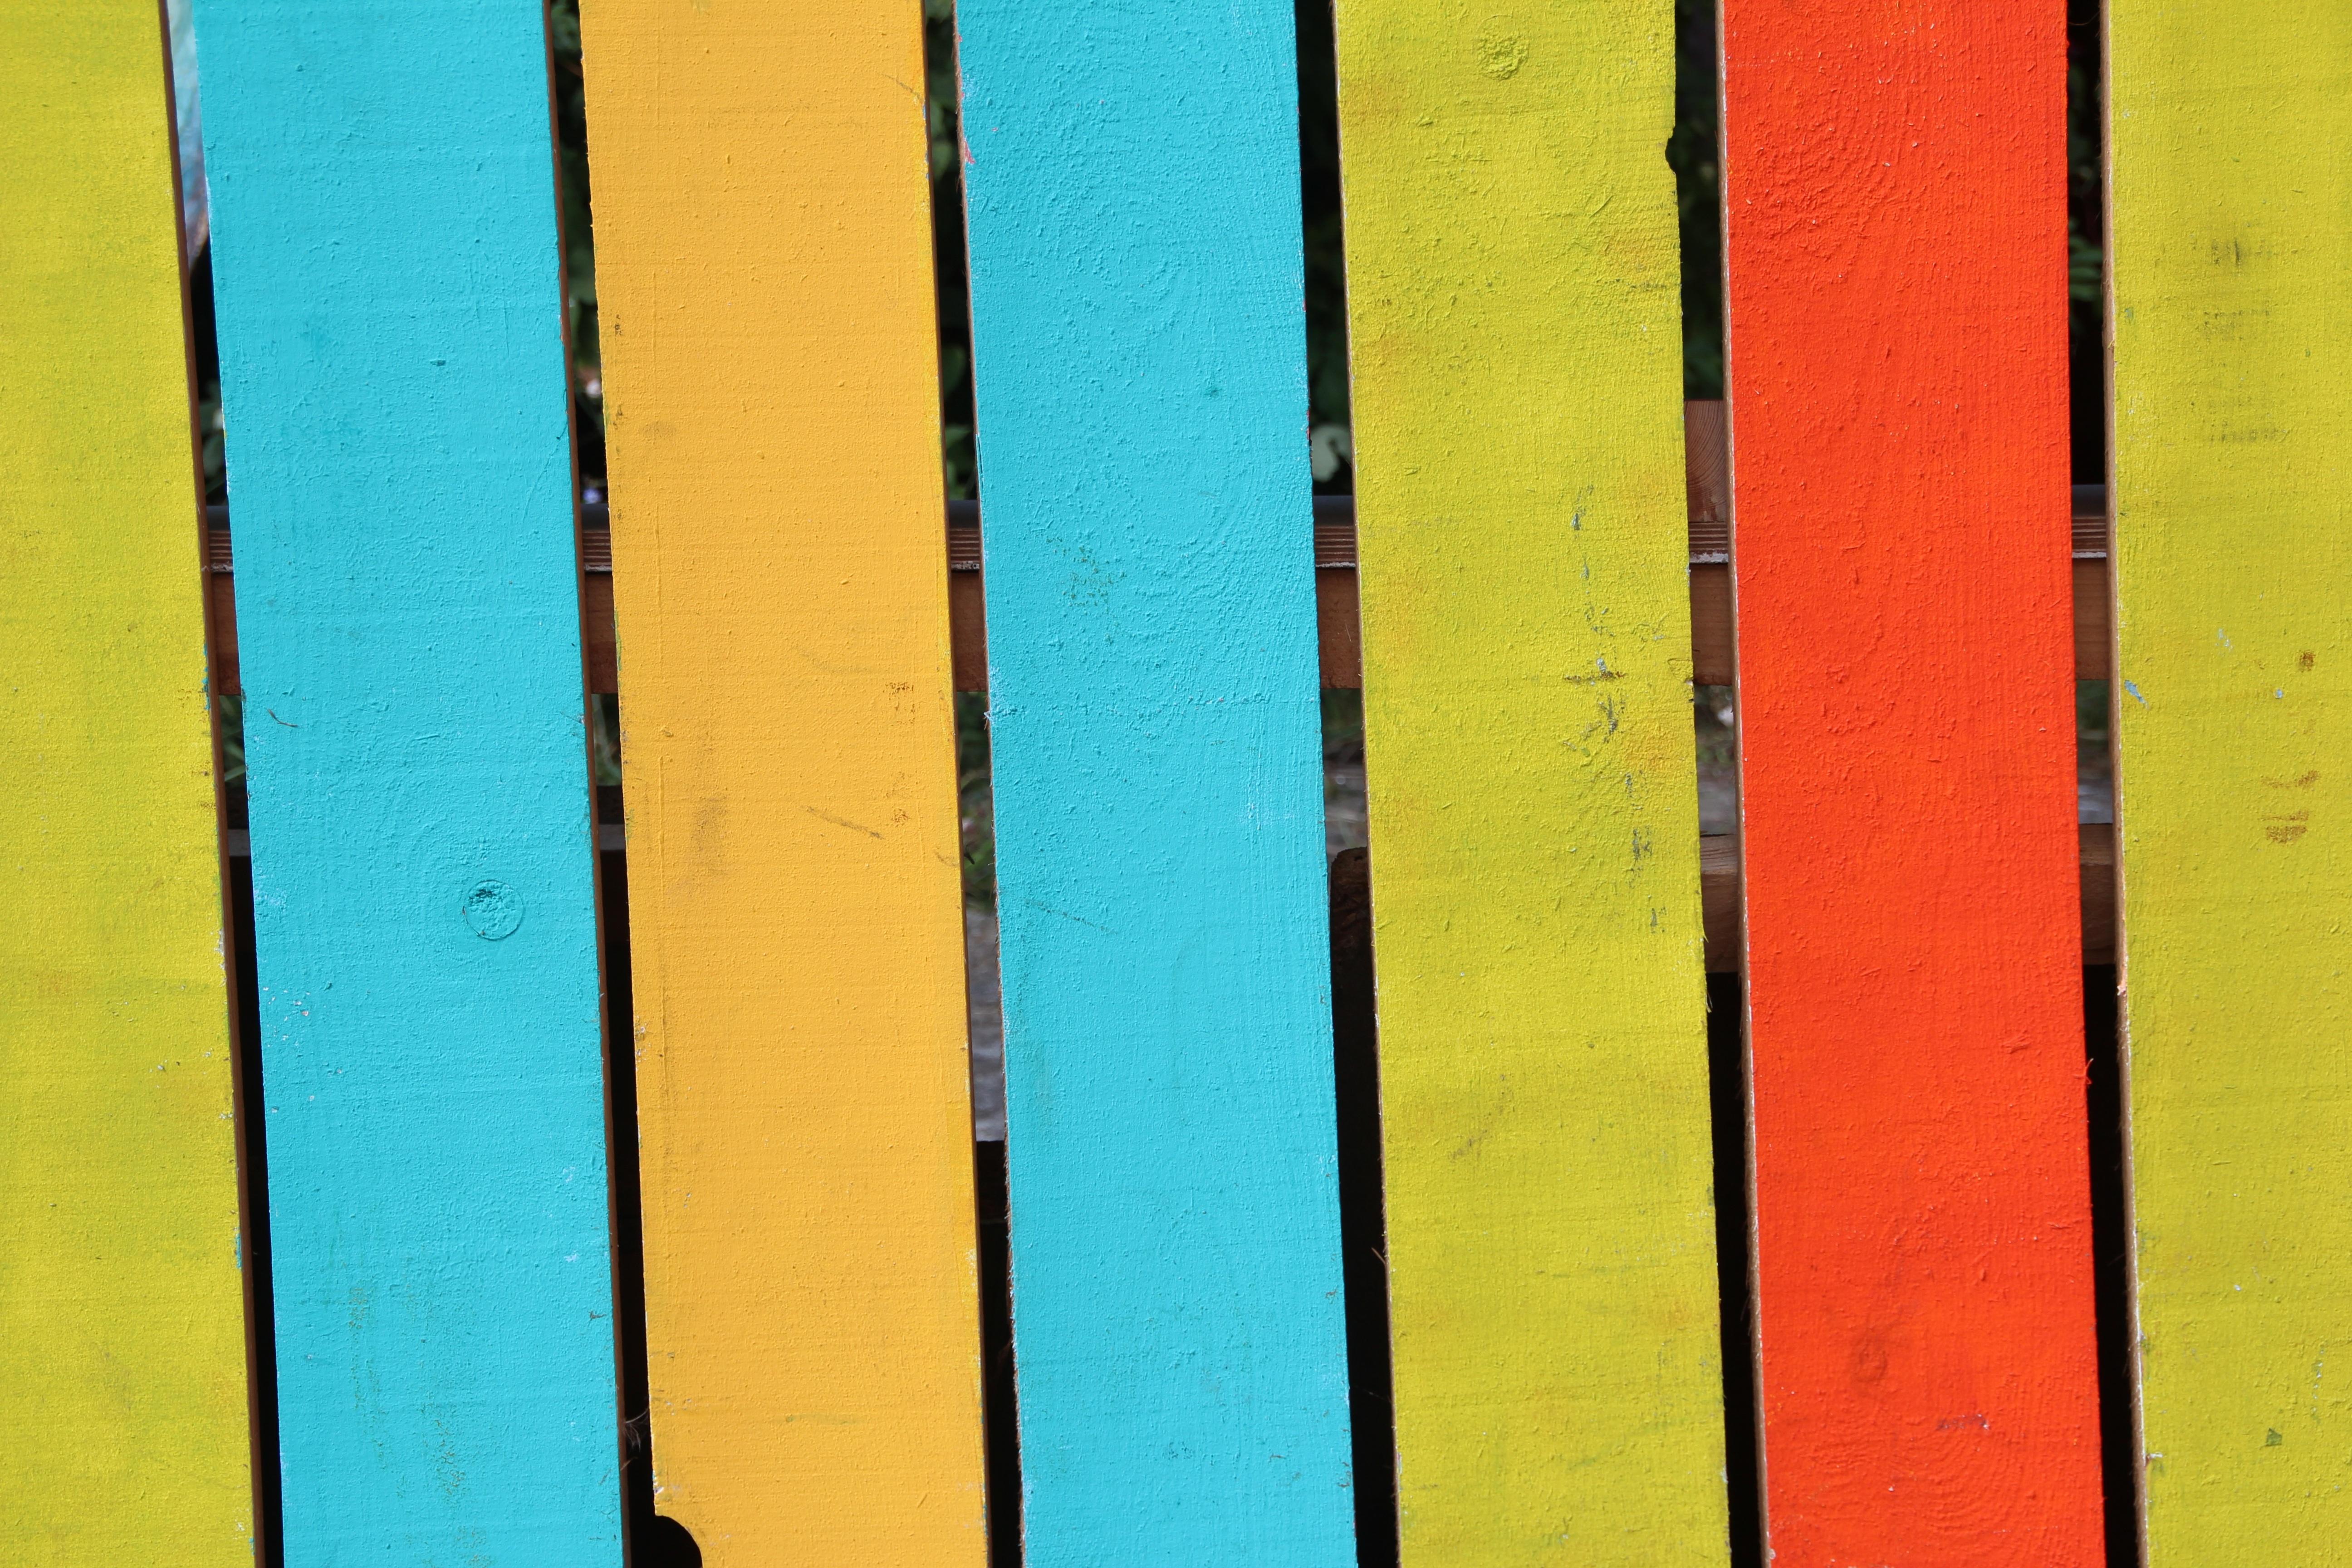 Gambar Pagar Tekstur Dinding Pola Garis Hijau Merah Warna